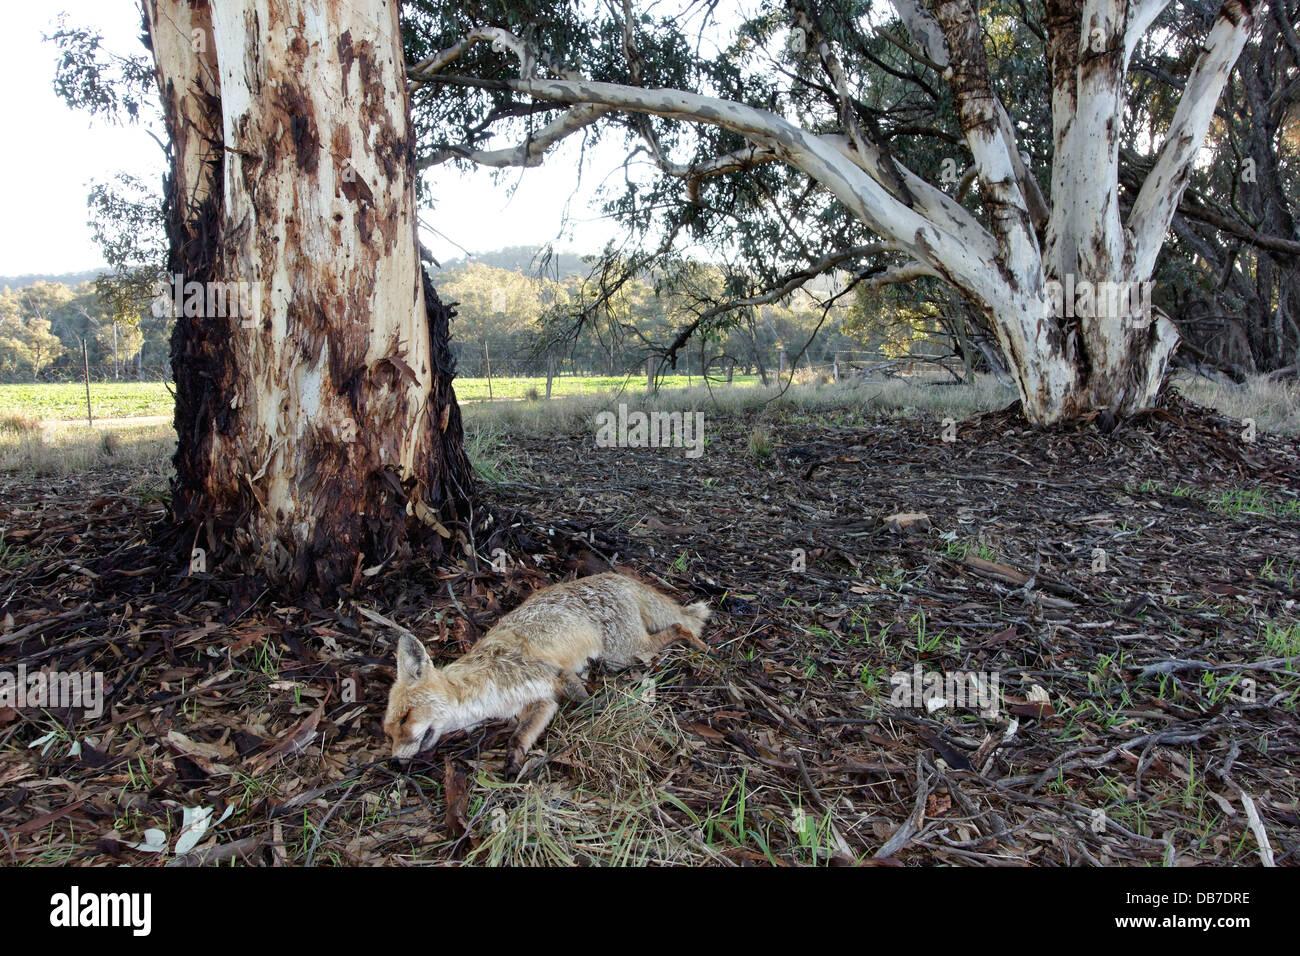 Dead Fox ( Vulpes vulpes ) laying beside a Eucalyptus Tree near farmland, Western Australia - Stock Image